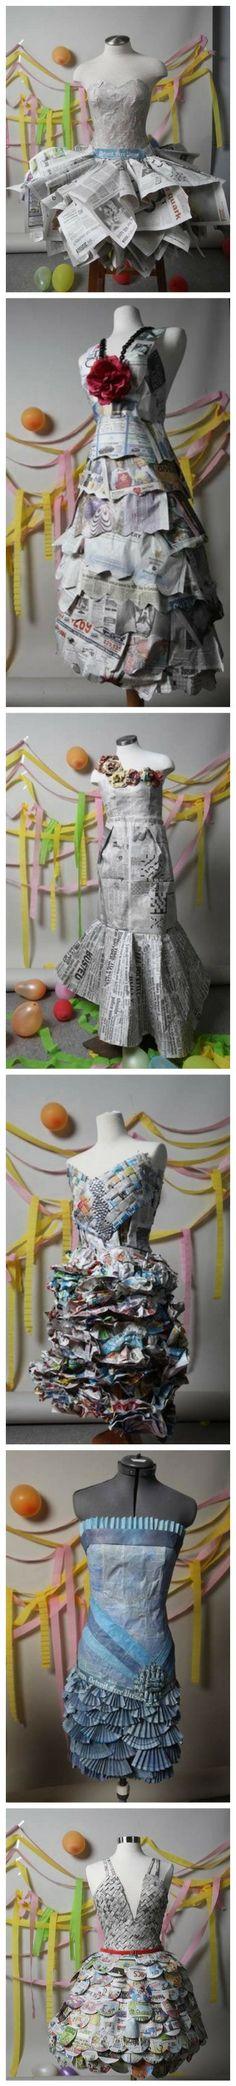 Newspaper prom dresses-Repurposed fashion